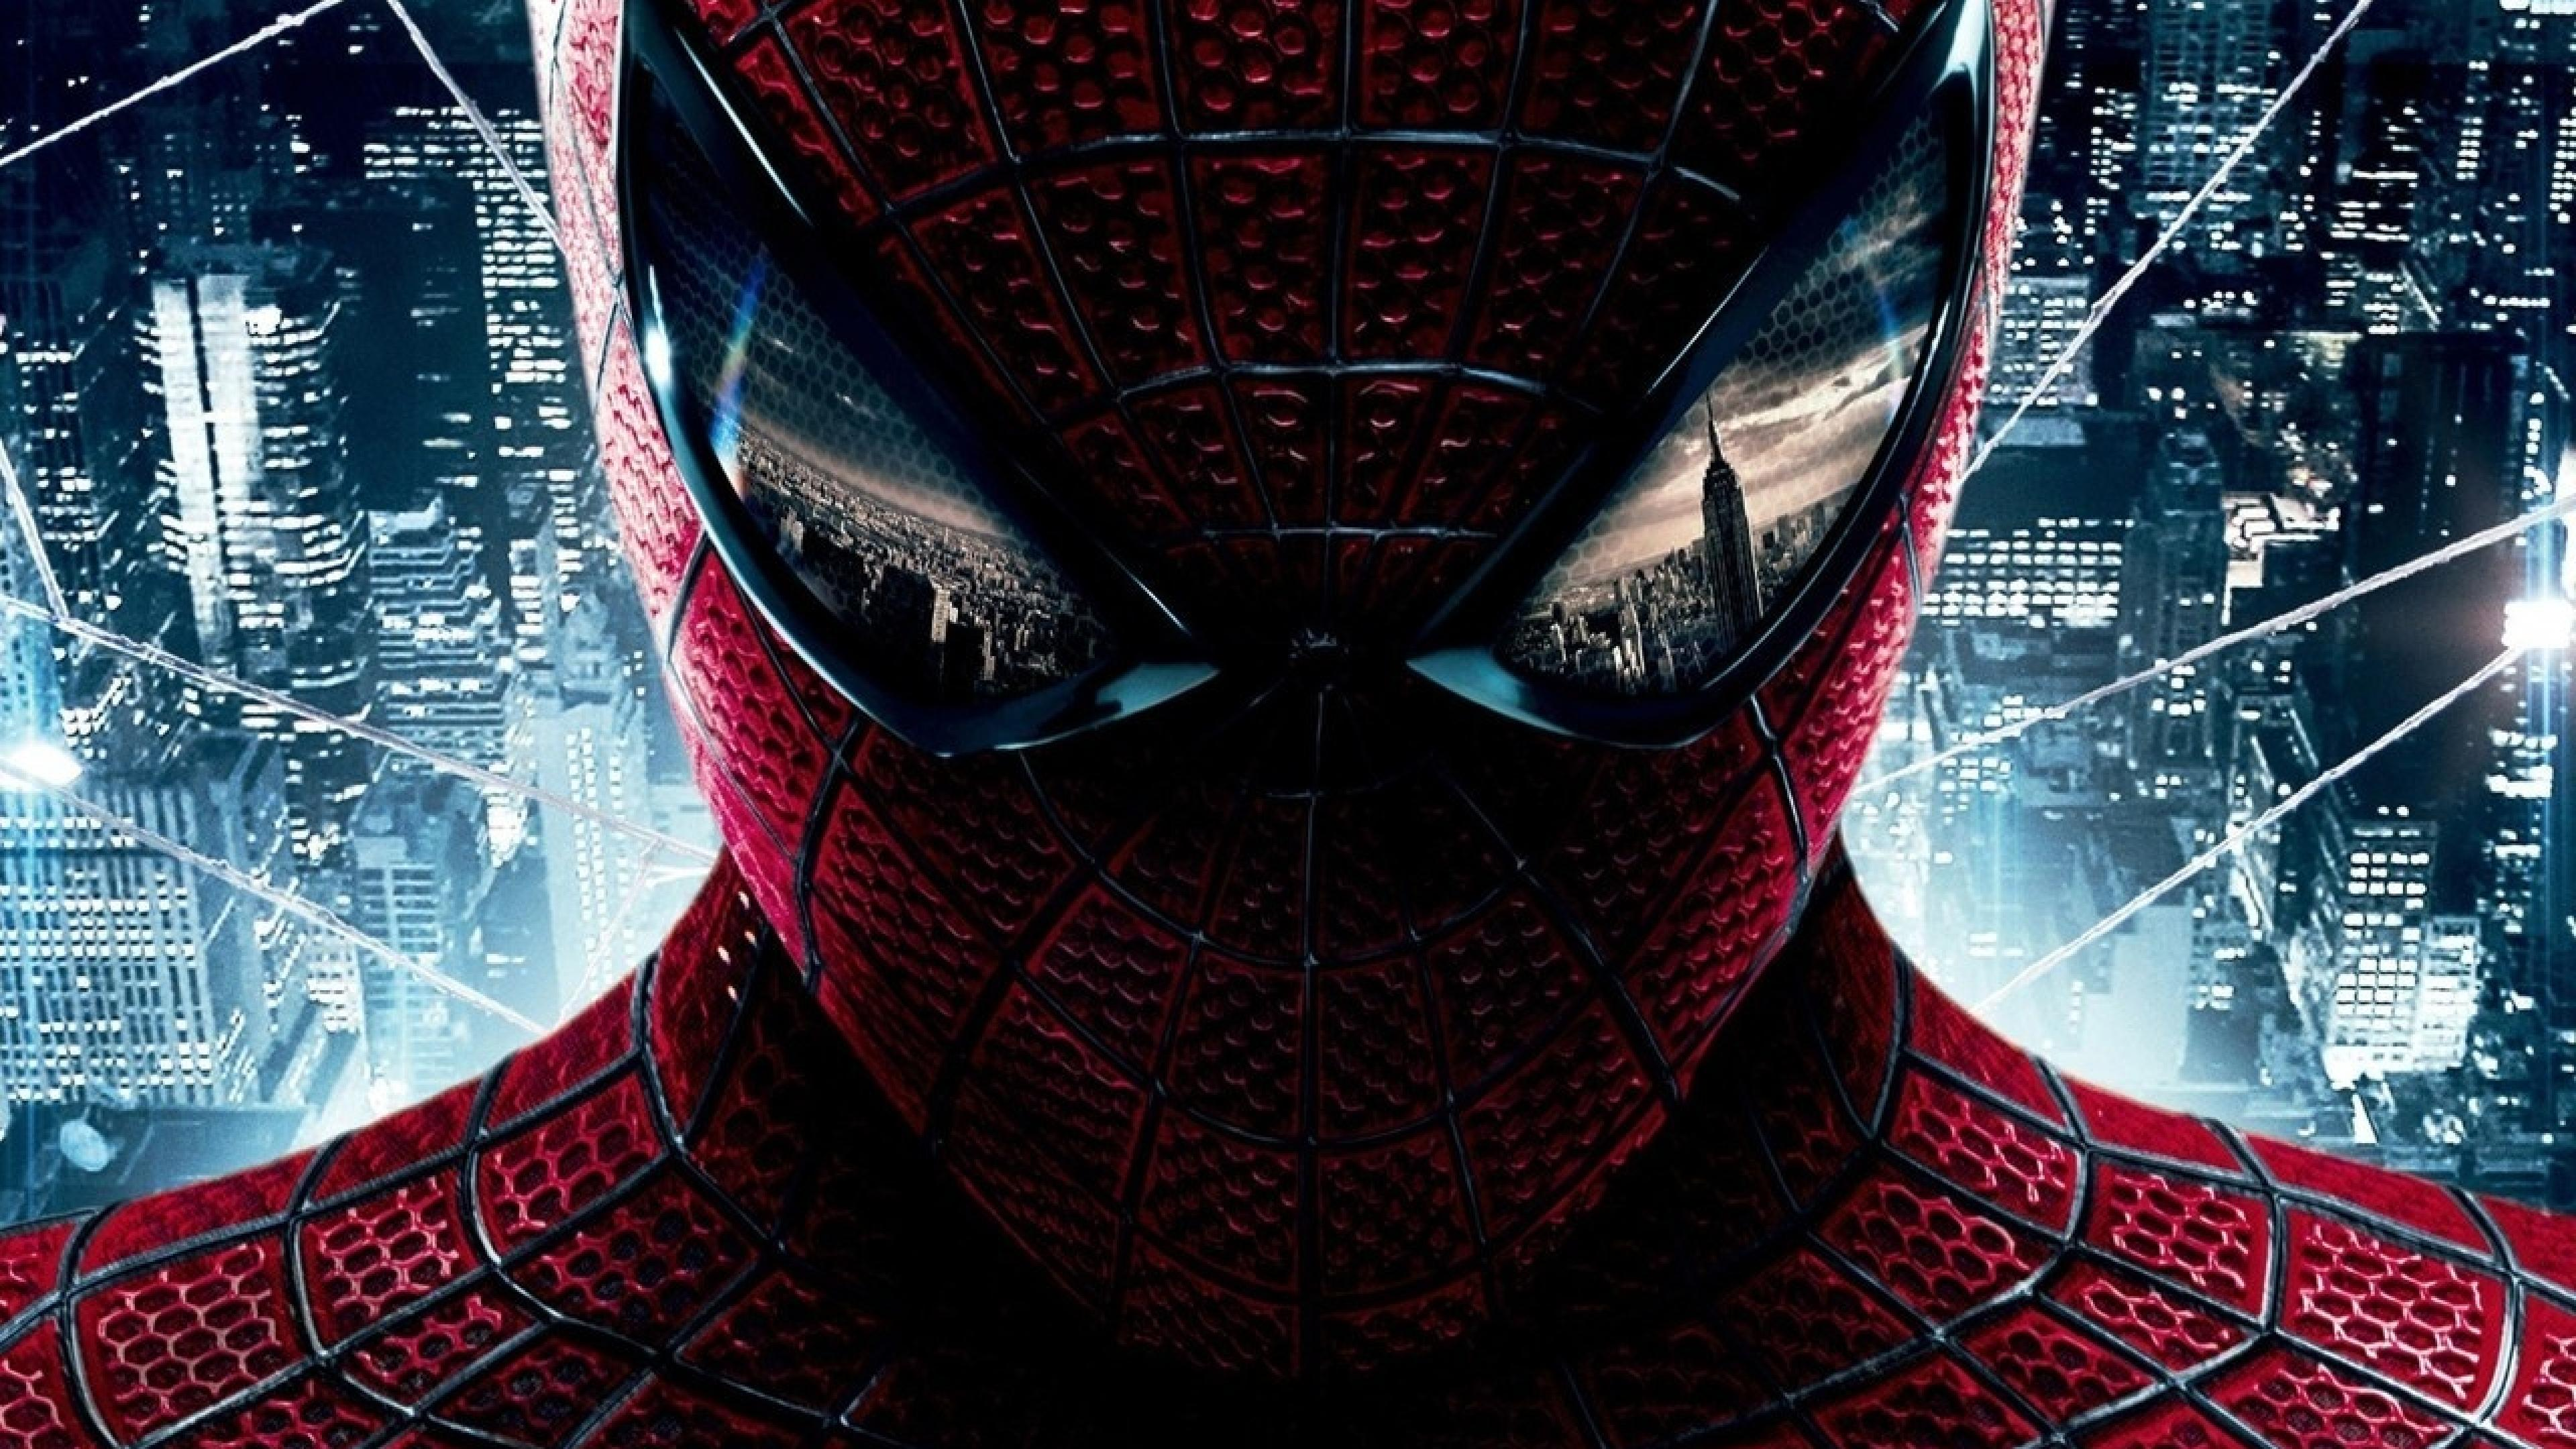 Best Superhero Movie Wallpapers Wallpaper 4 U 3840x2160